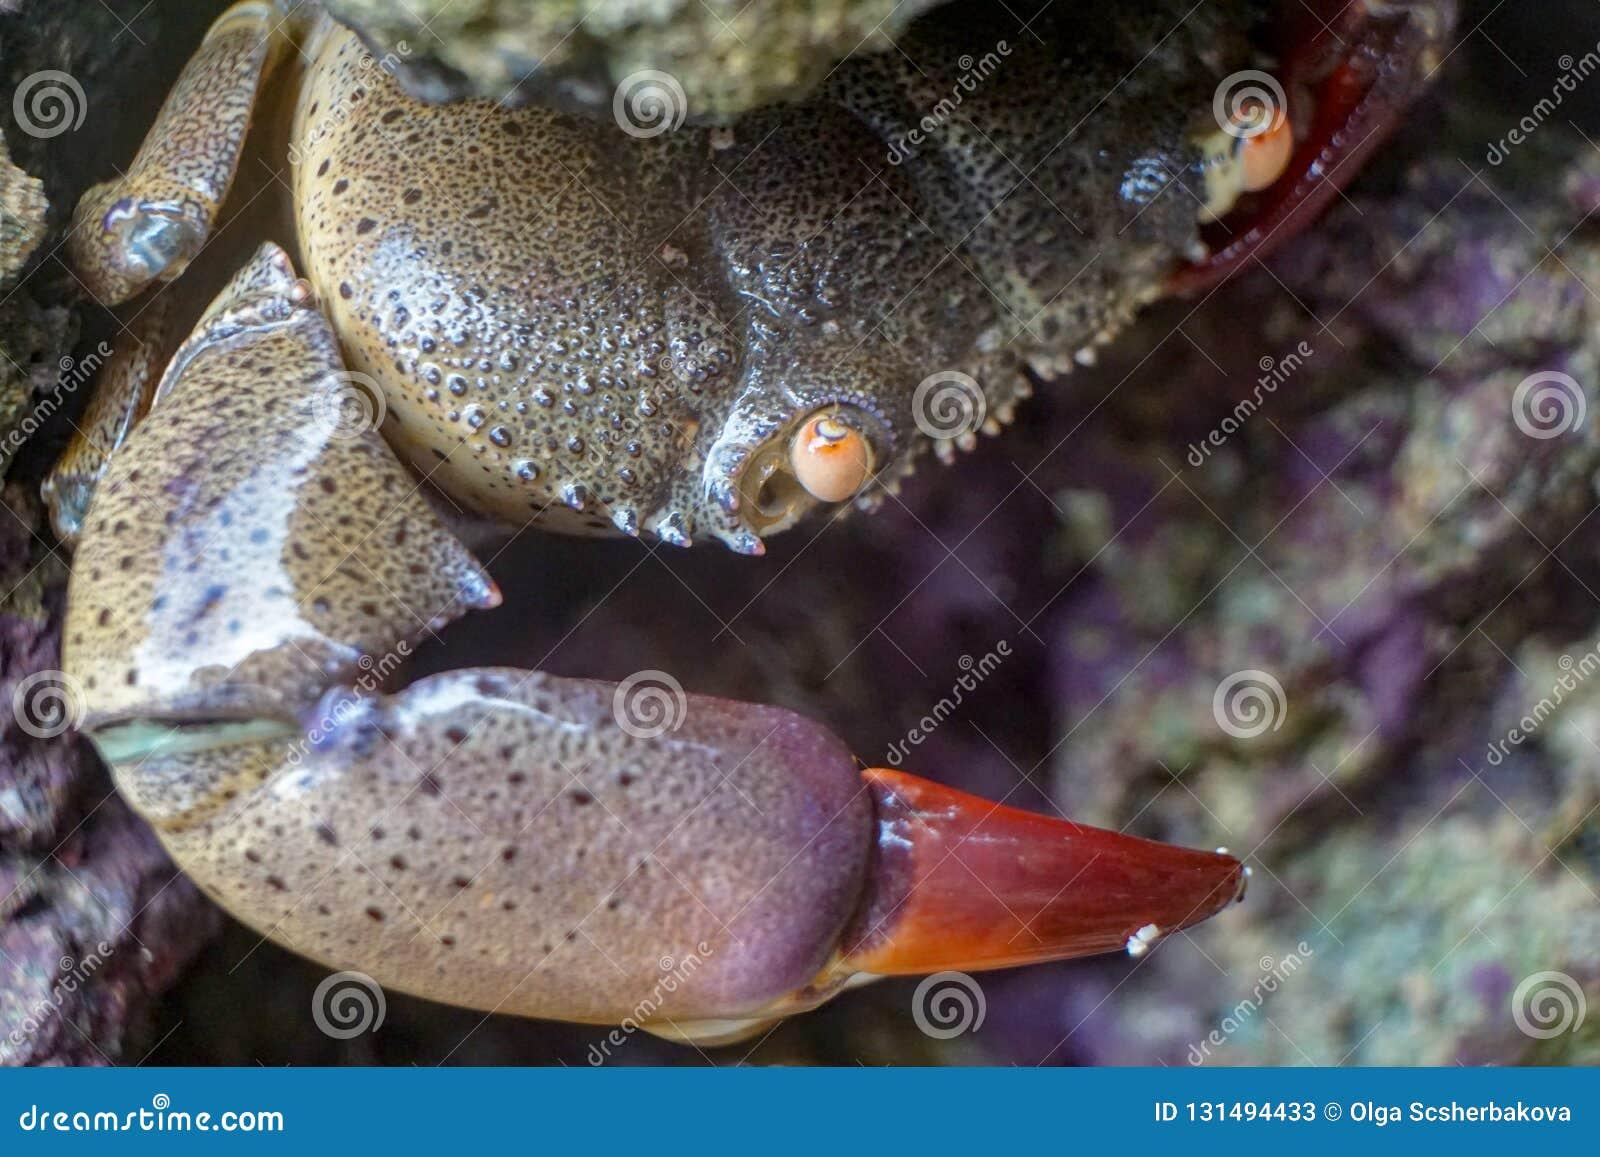 Grote krab met rode klauw